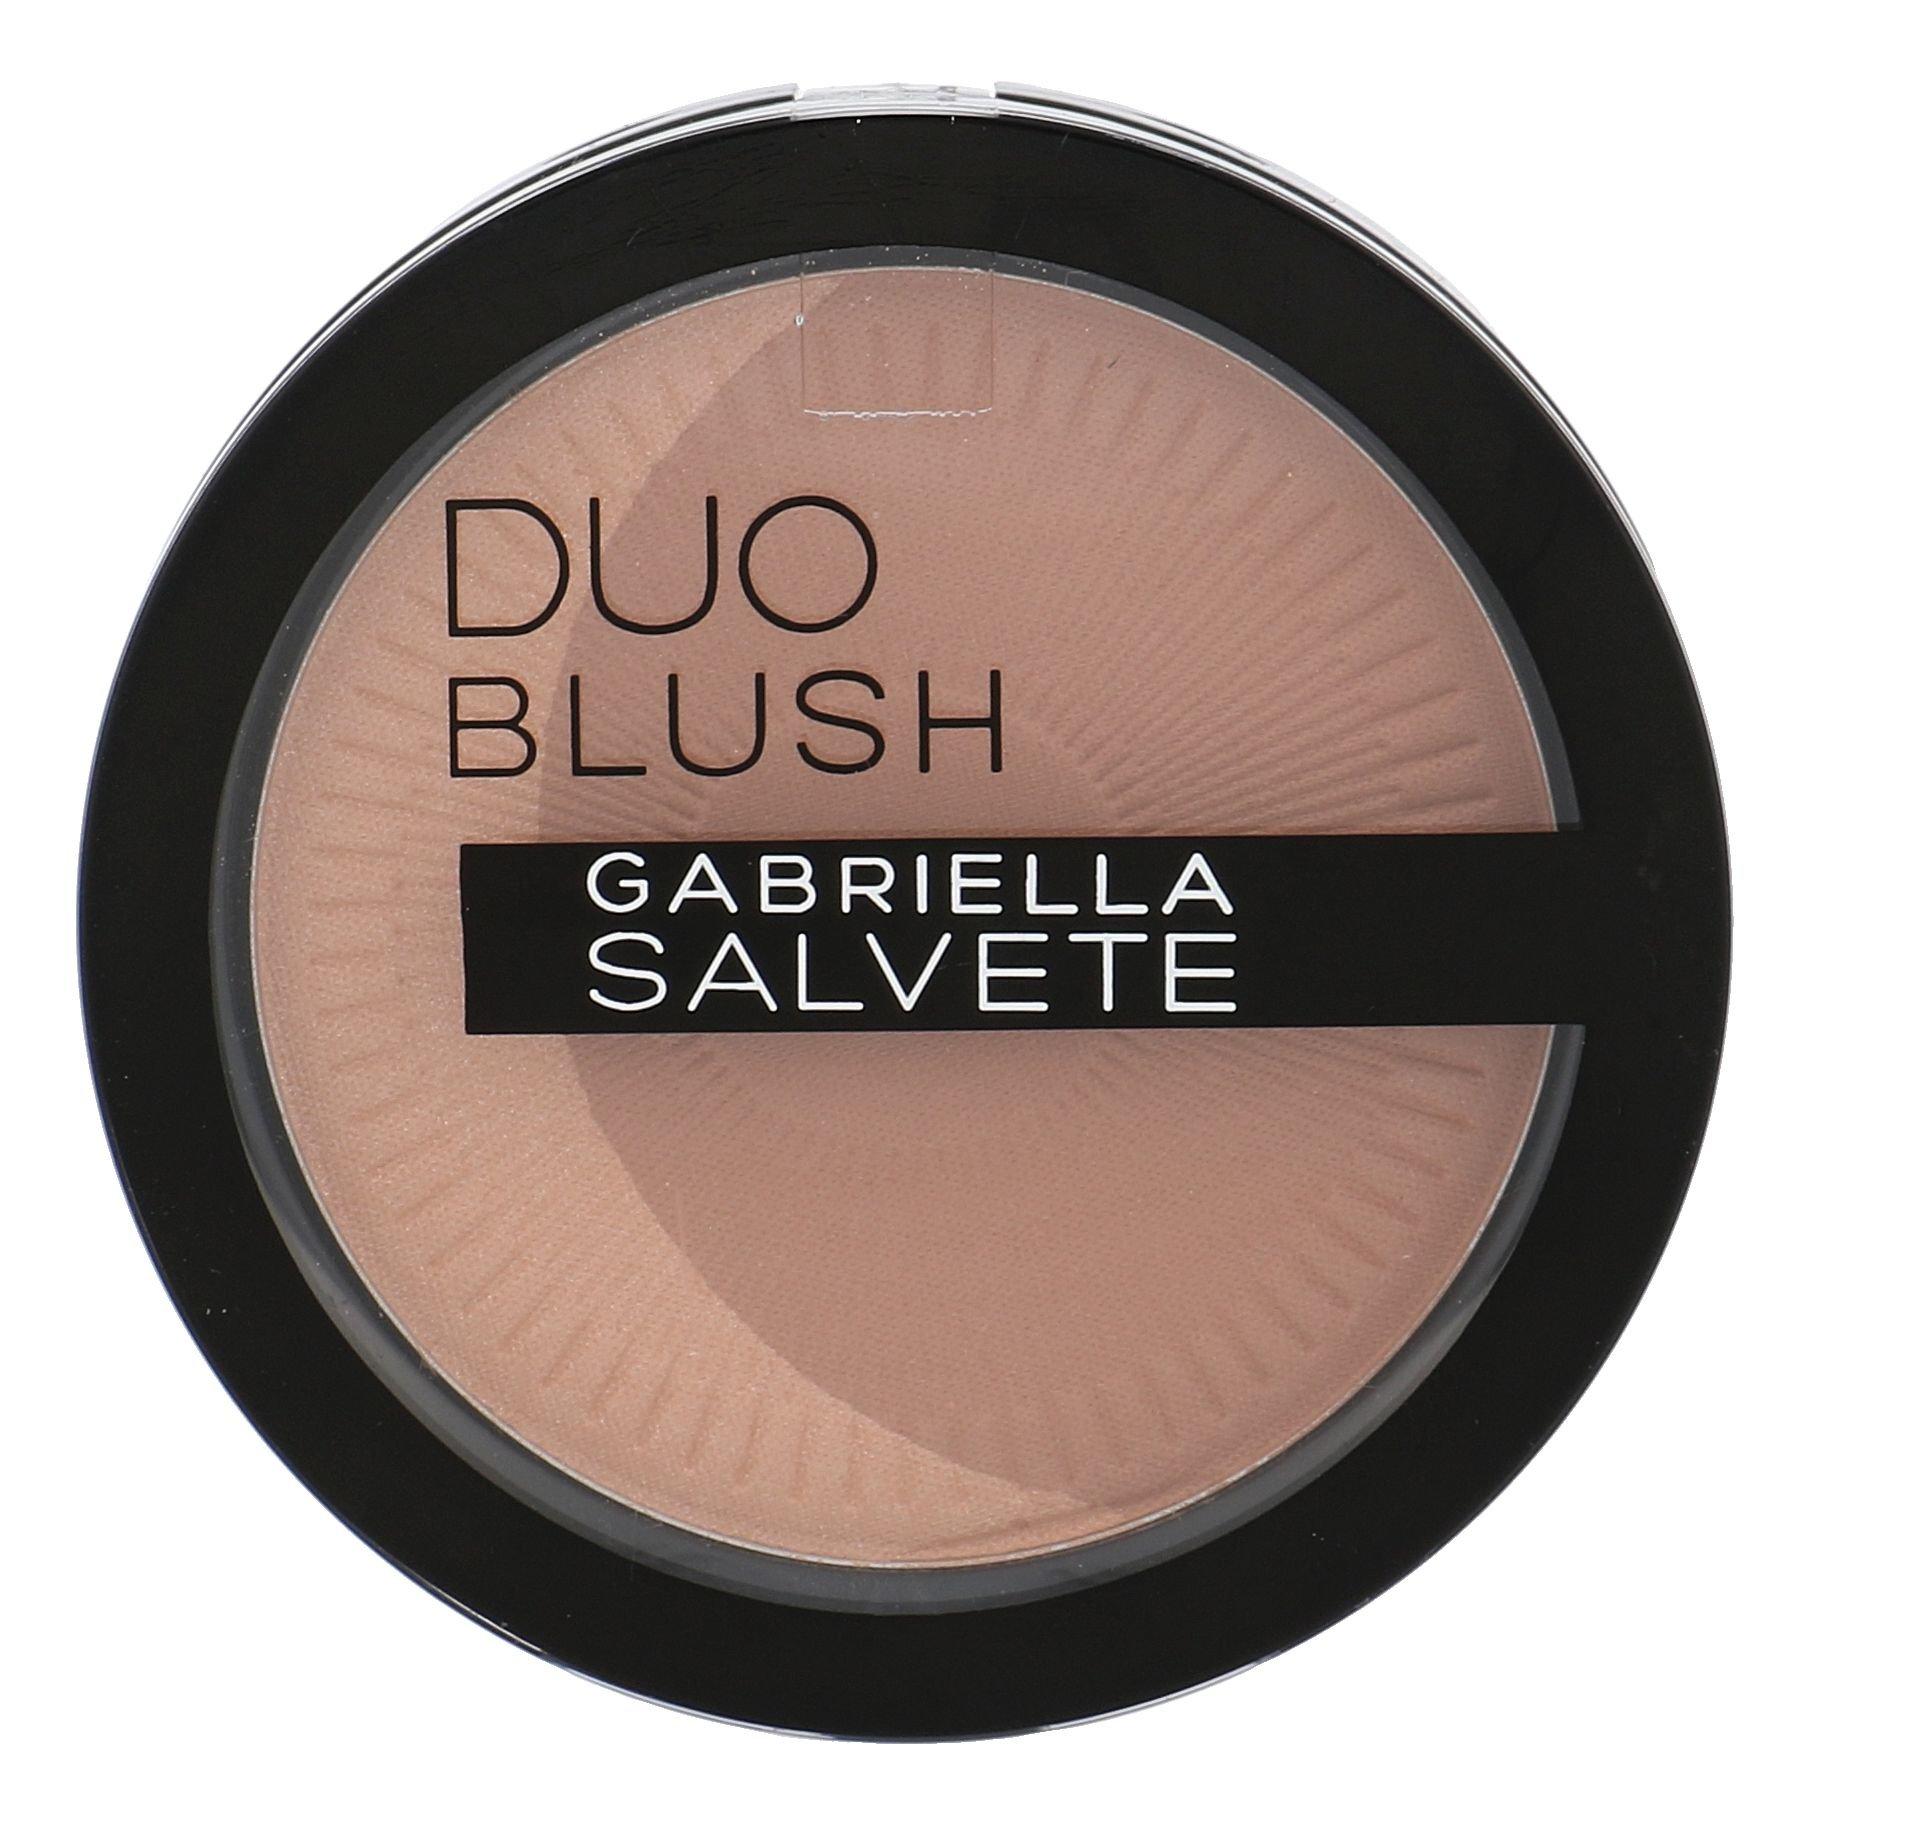 Gabriella Salvete Duo Blush Cosmetic 8ml 04